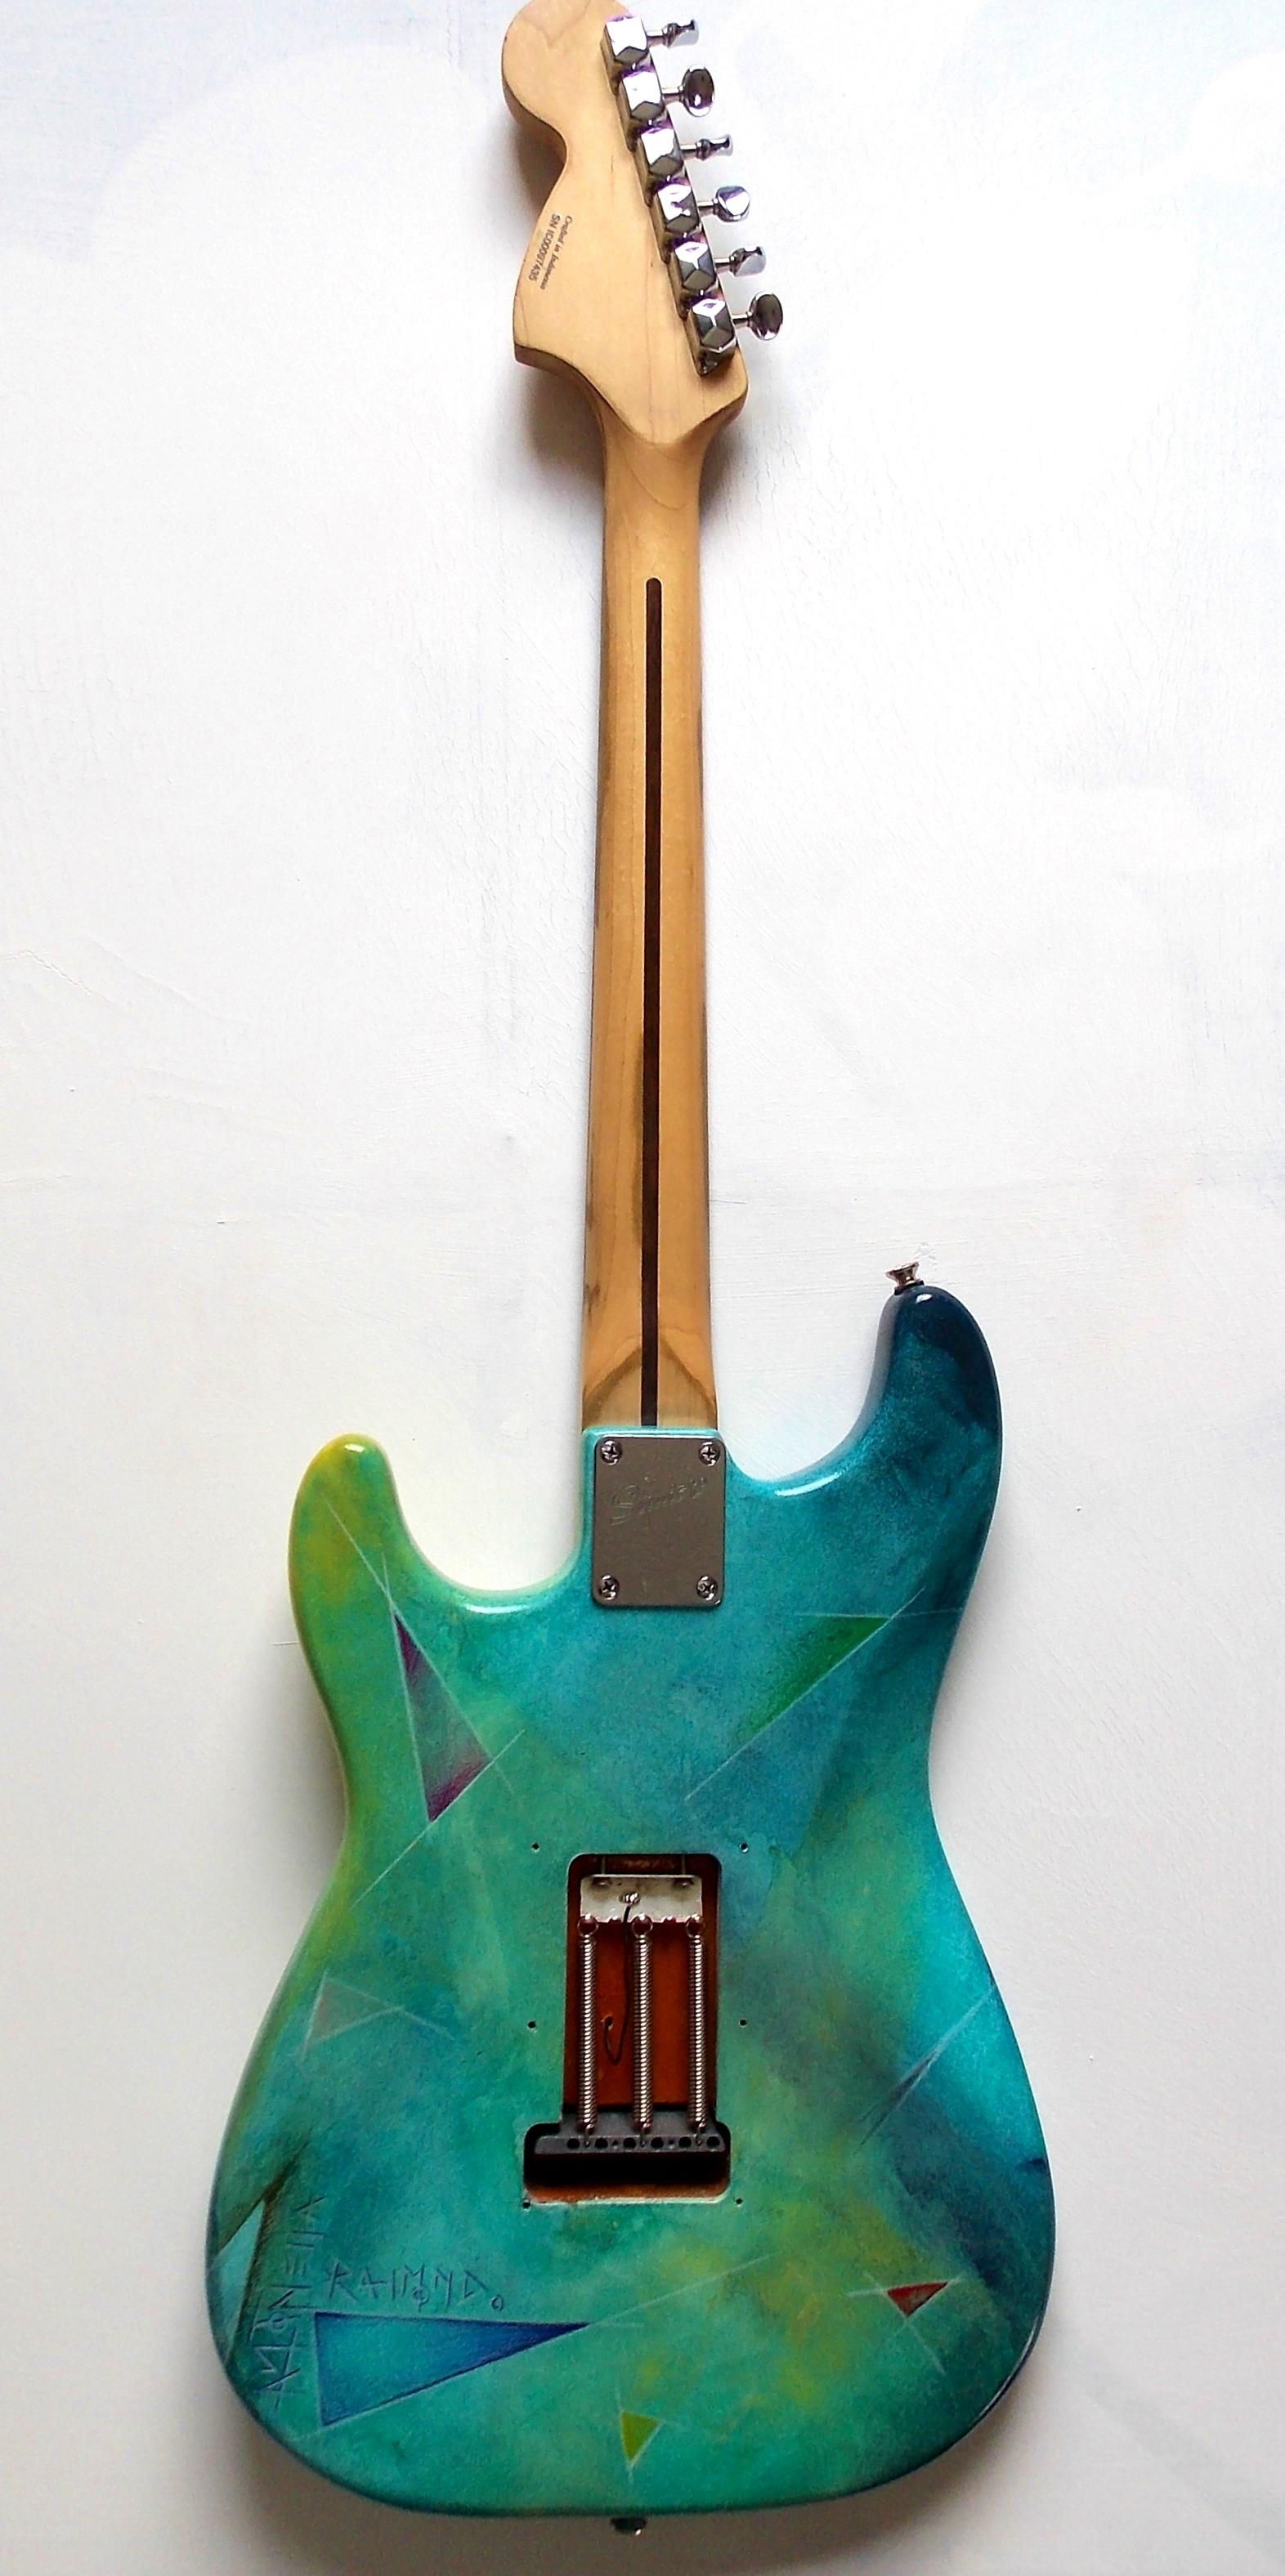 Heart guitar back